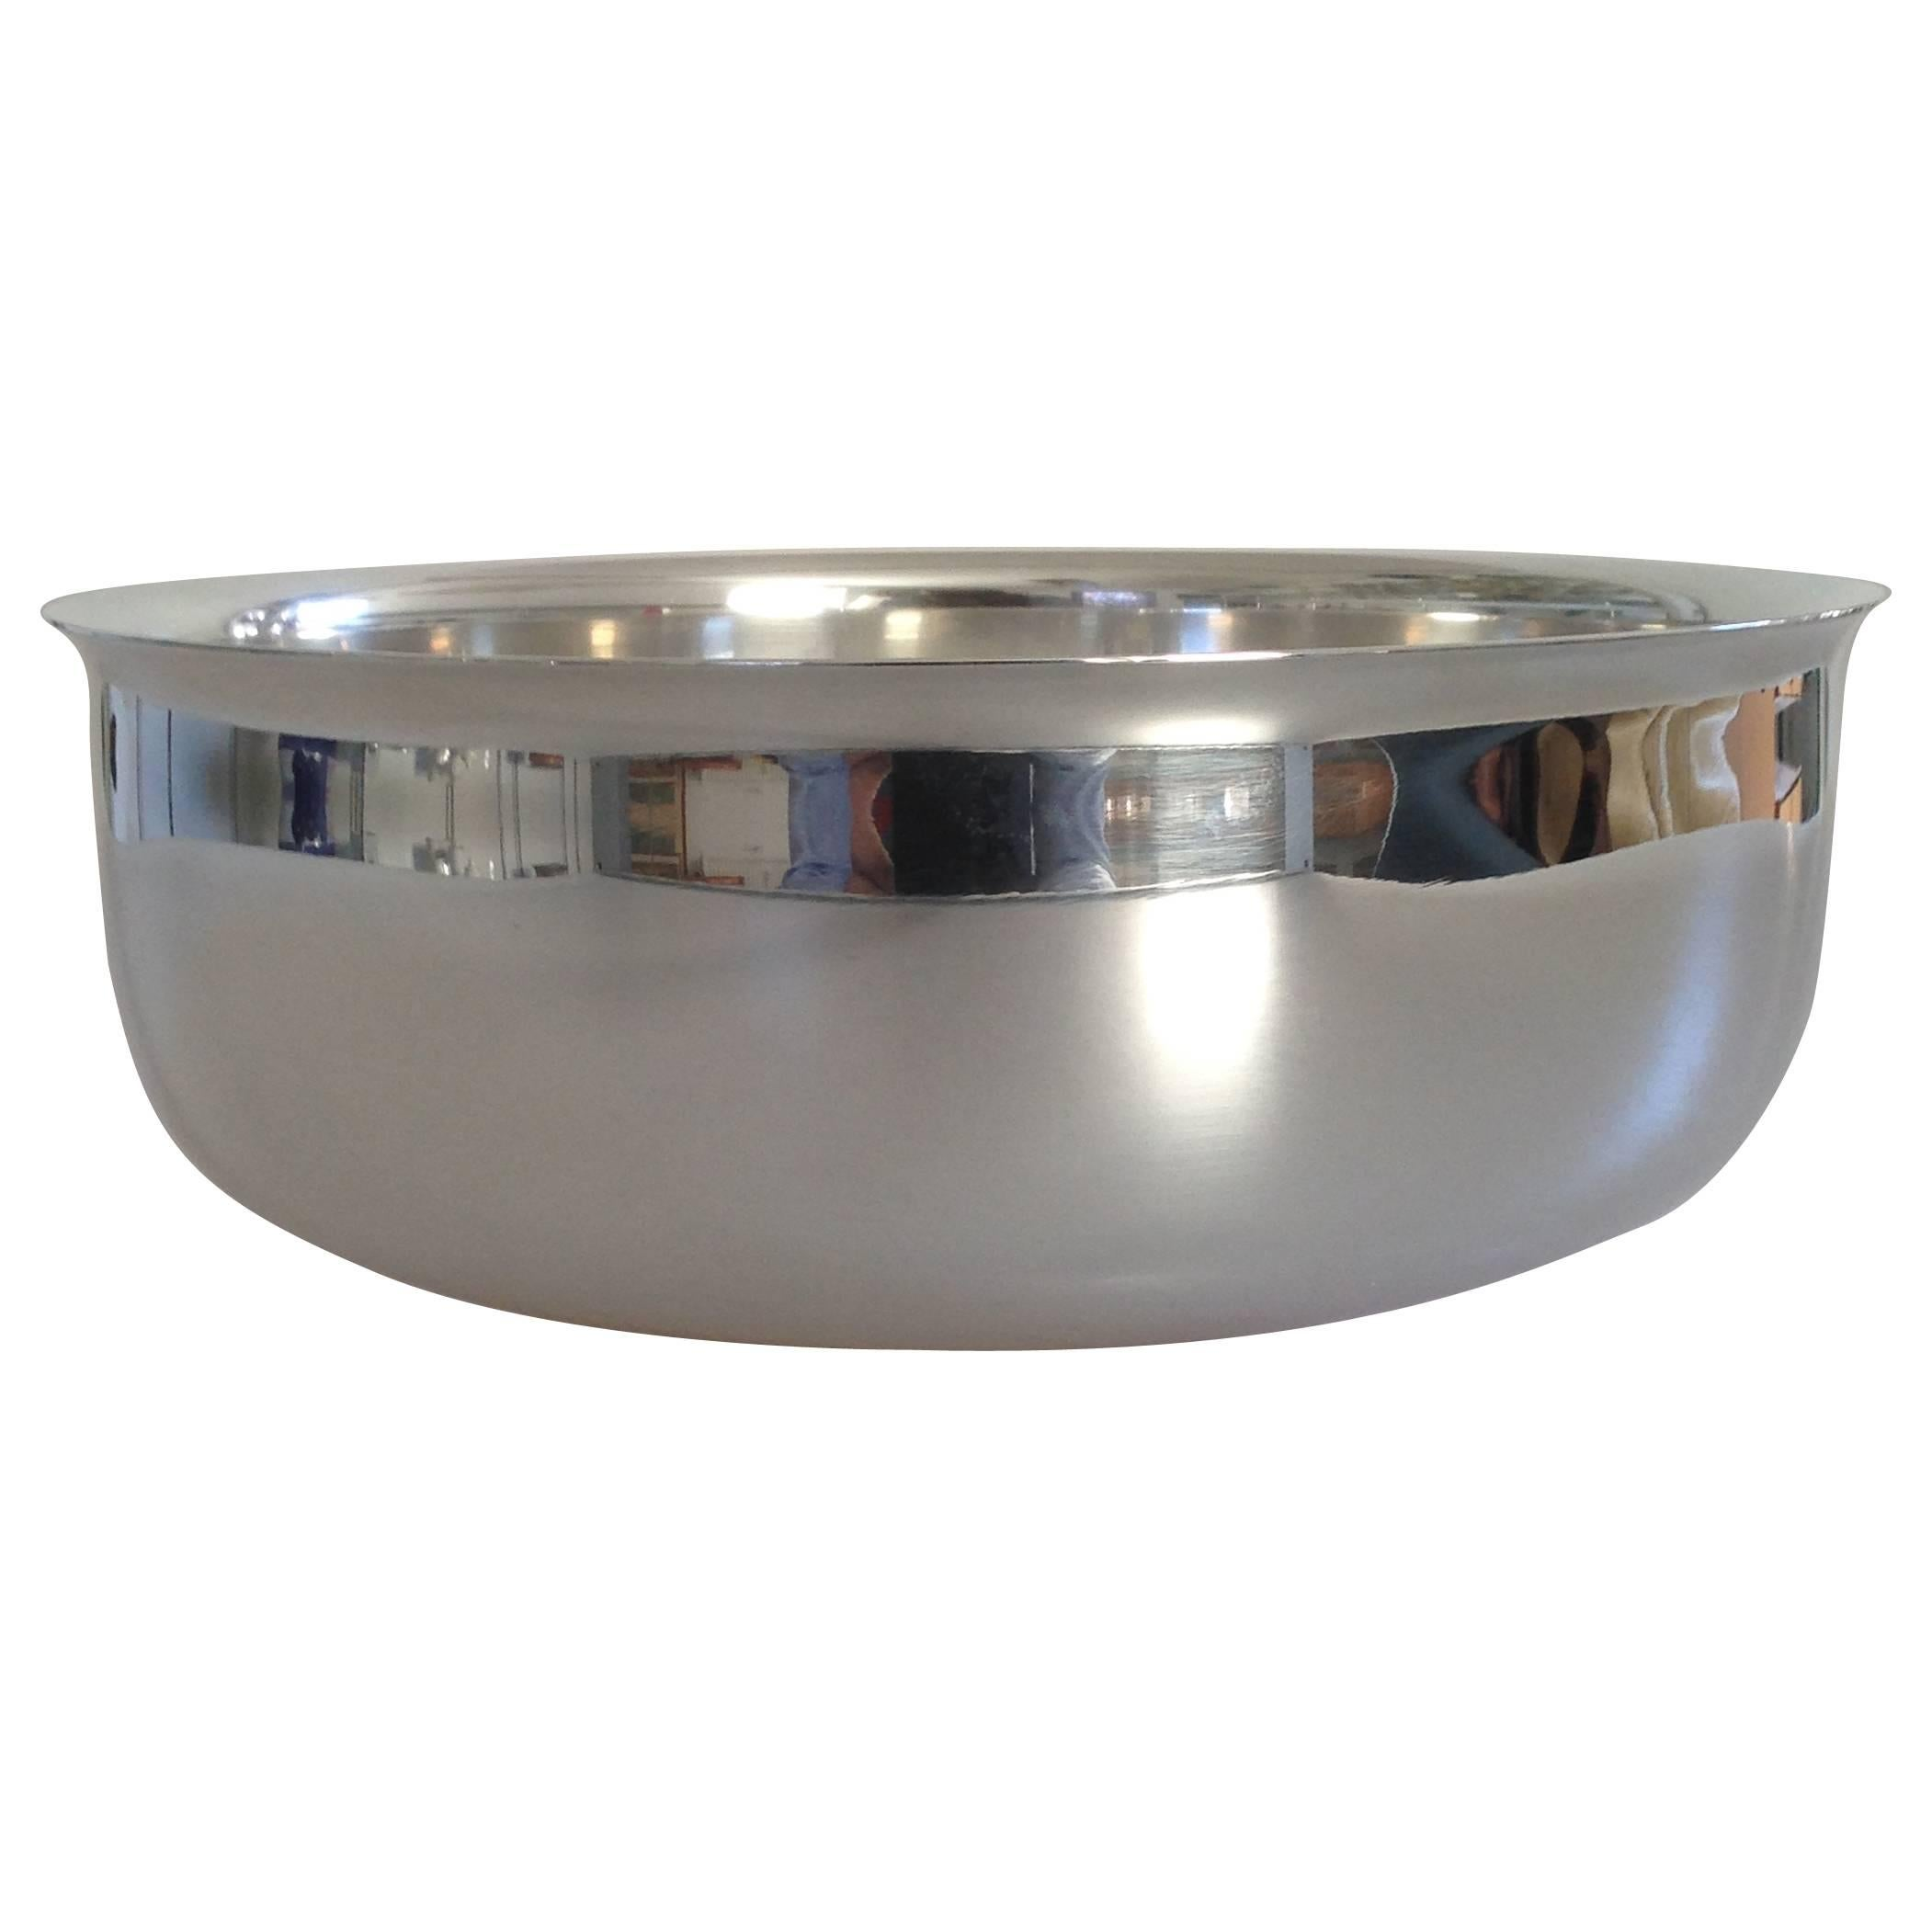 Georg Jensen Sterling Silver Bowl by Alev Siesbye